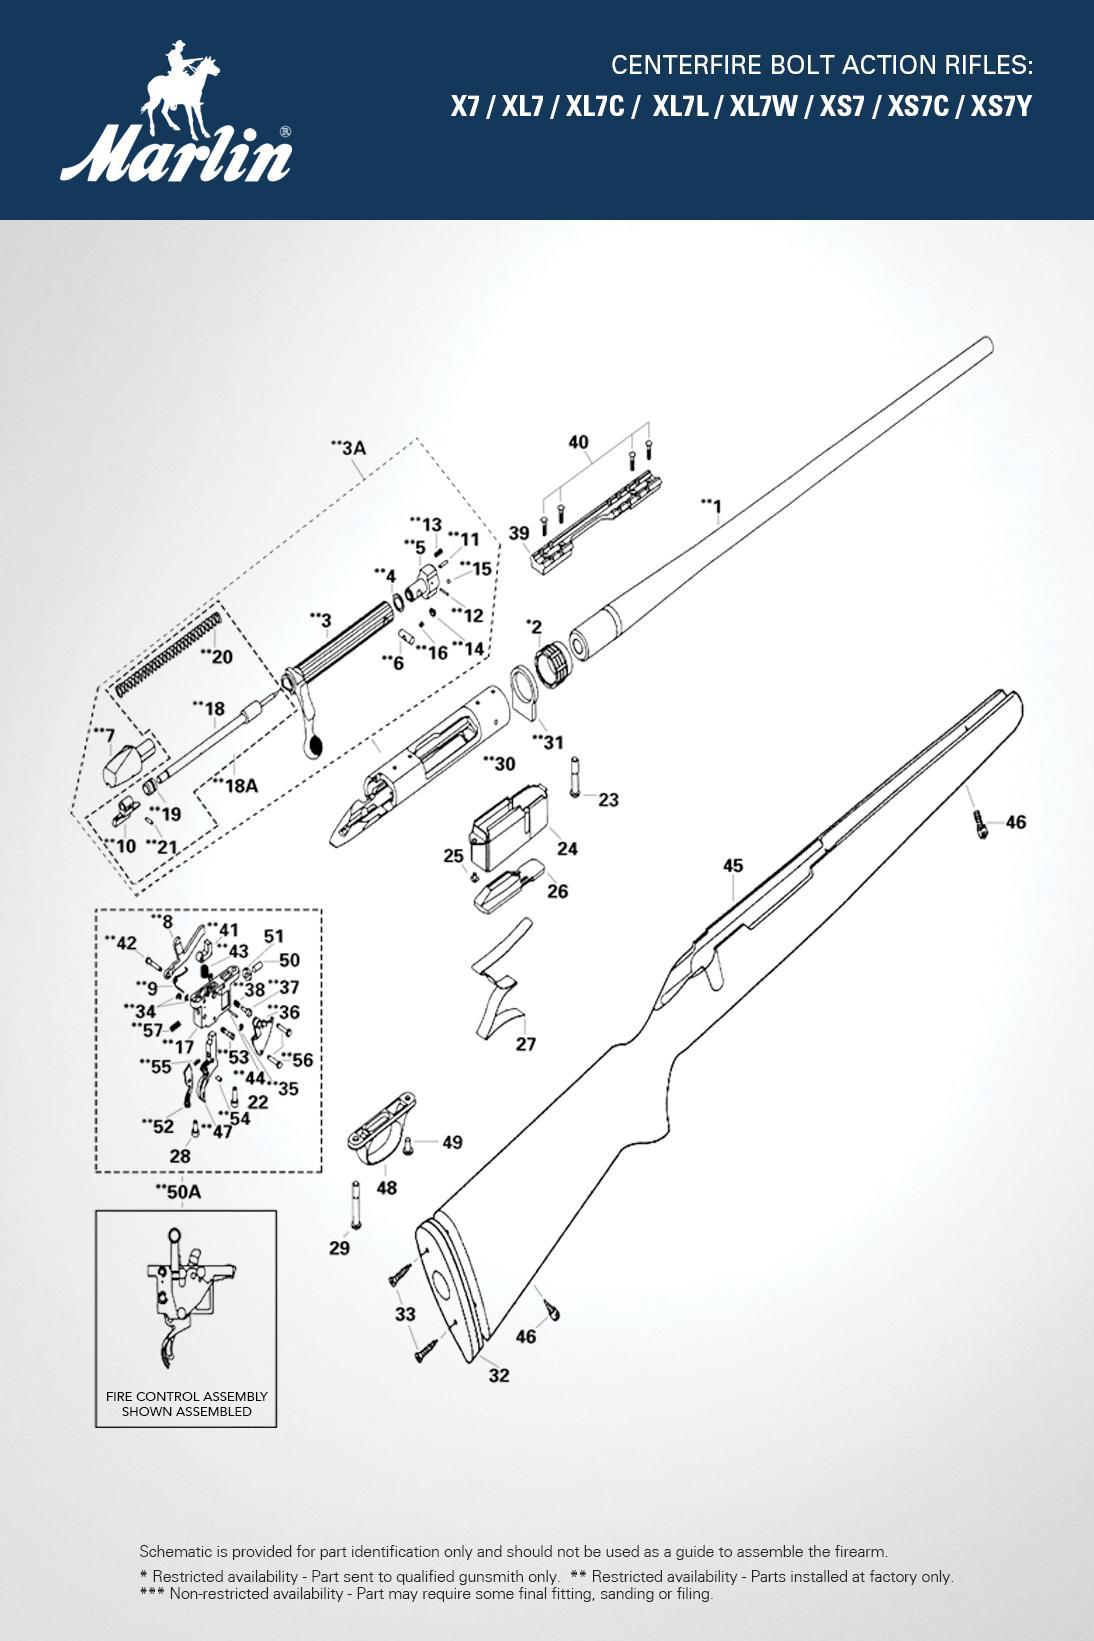 Model X7